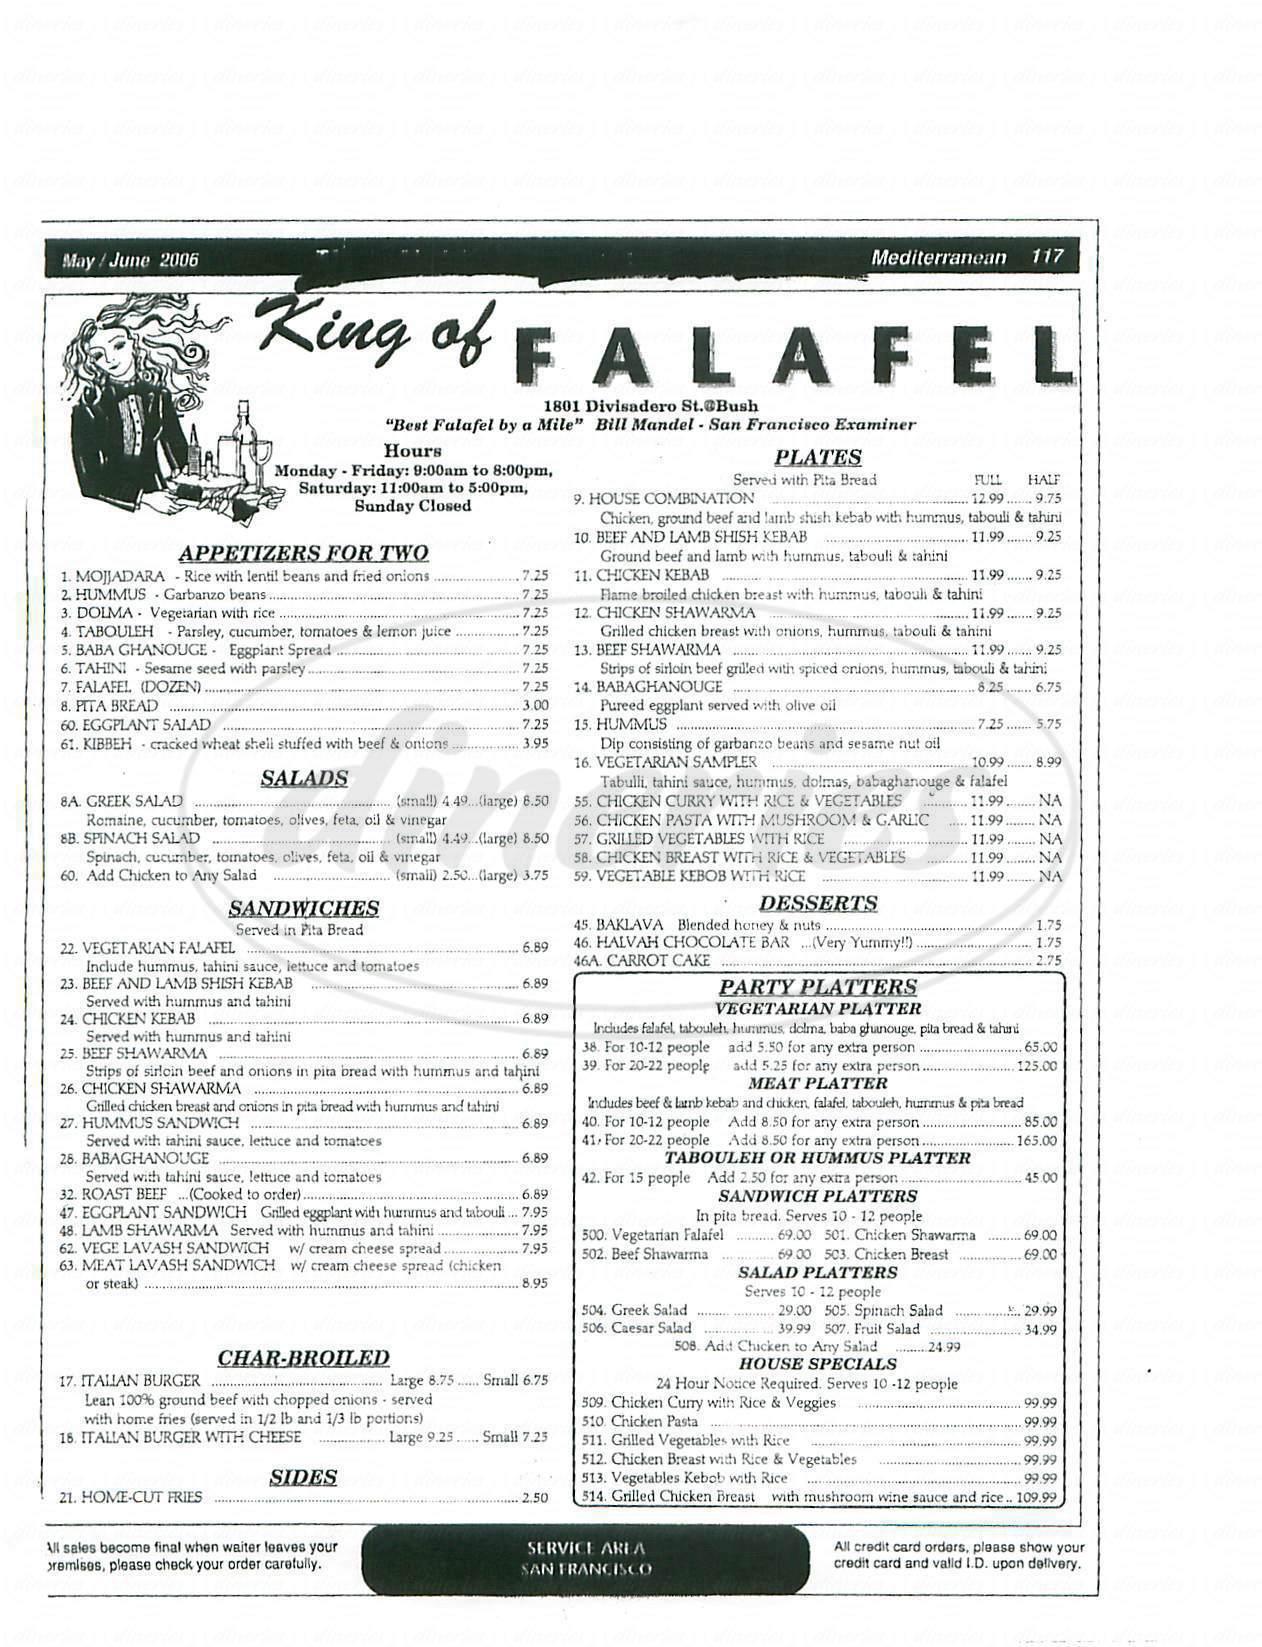 menu for King of Falafel